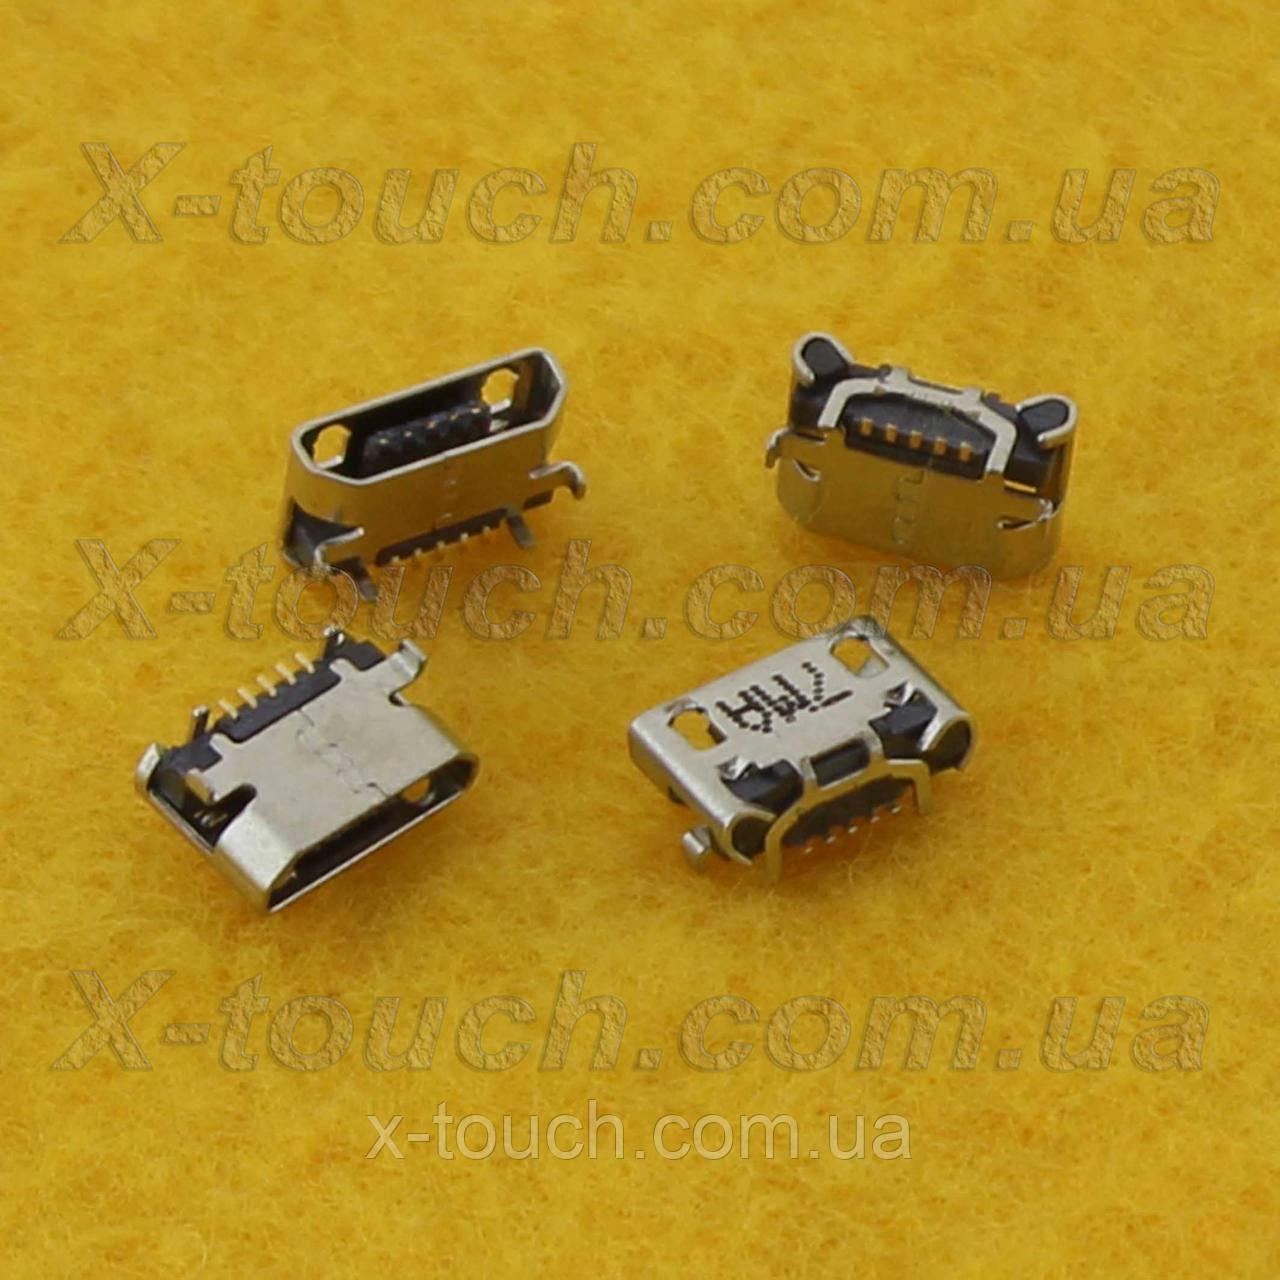 ASUS FonePad 7 разъем зарядки micro-B USB 5pin.